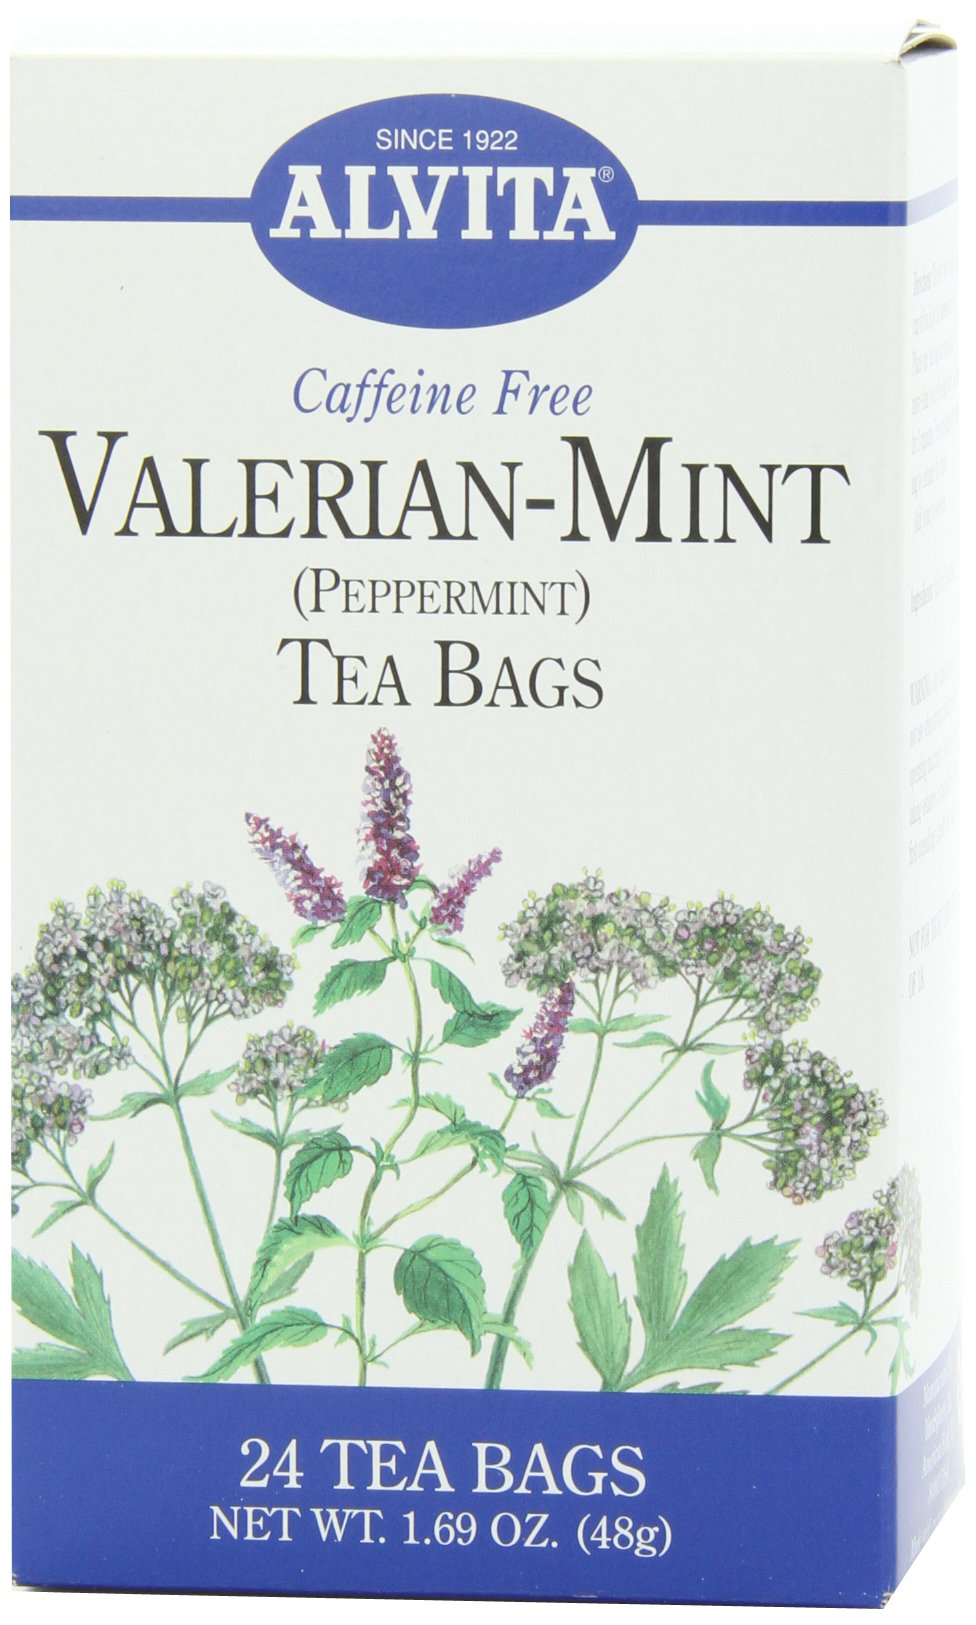 Alvita Herbal Teas, Valerian Mint (Peppermint), 24-Count Tea Bags (Pack of 6)